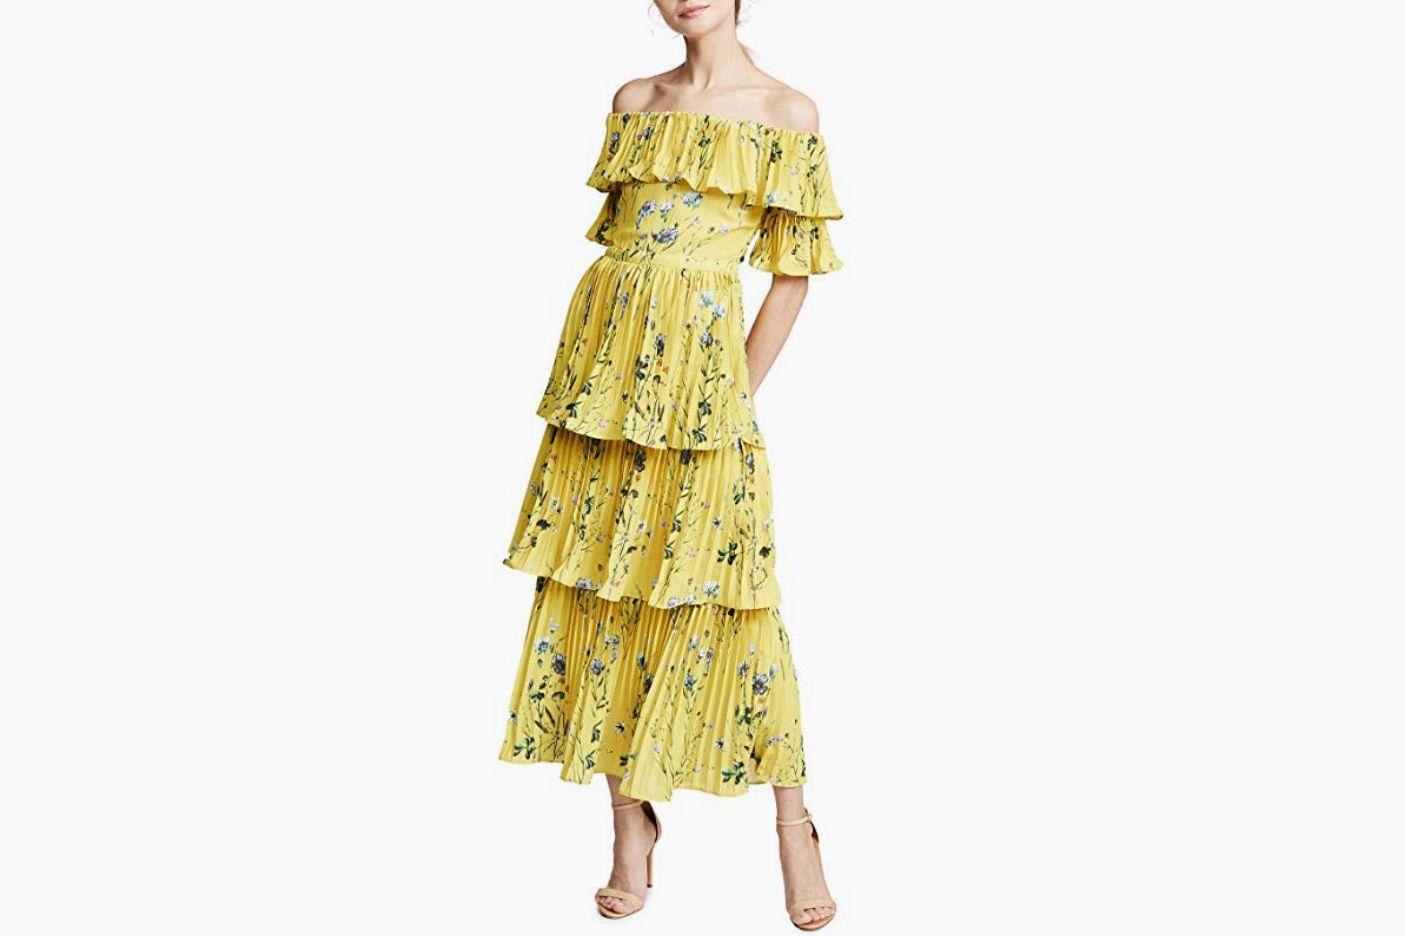 OPT Vimmy Dress